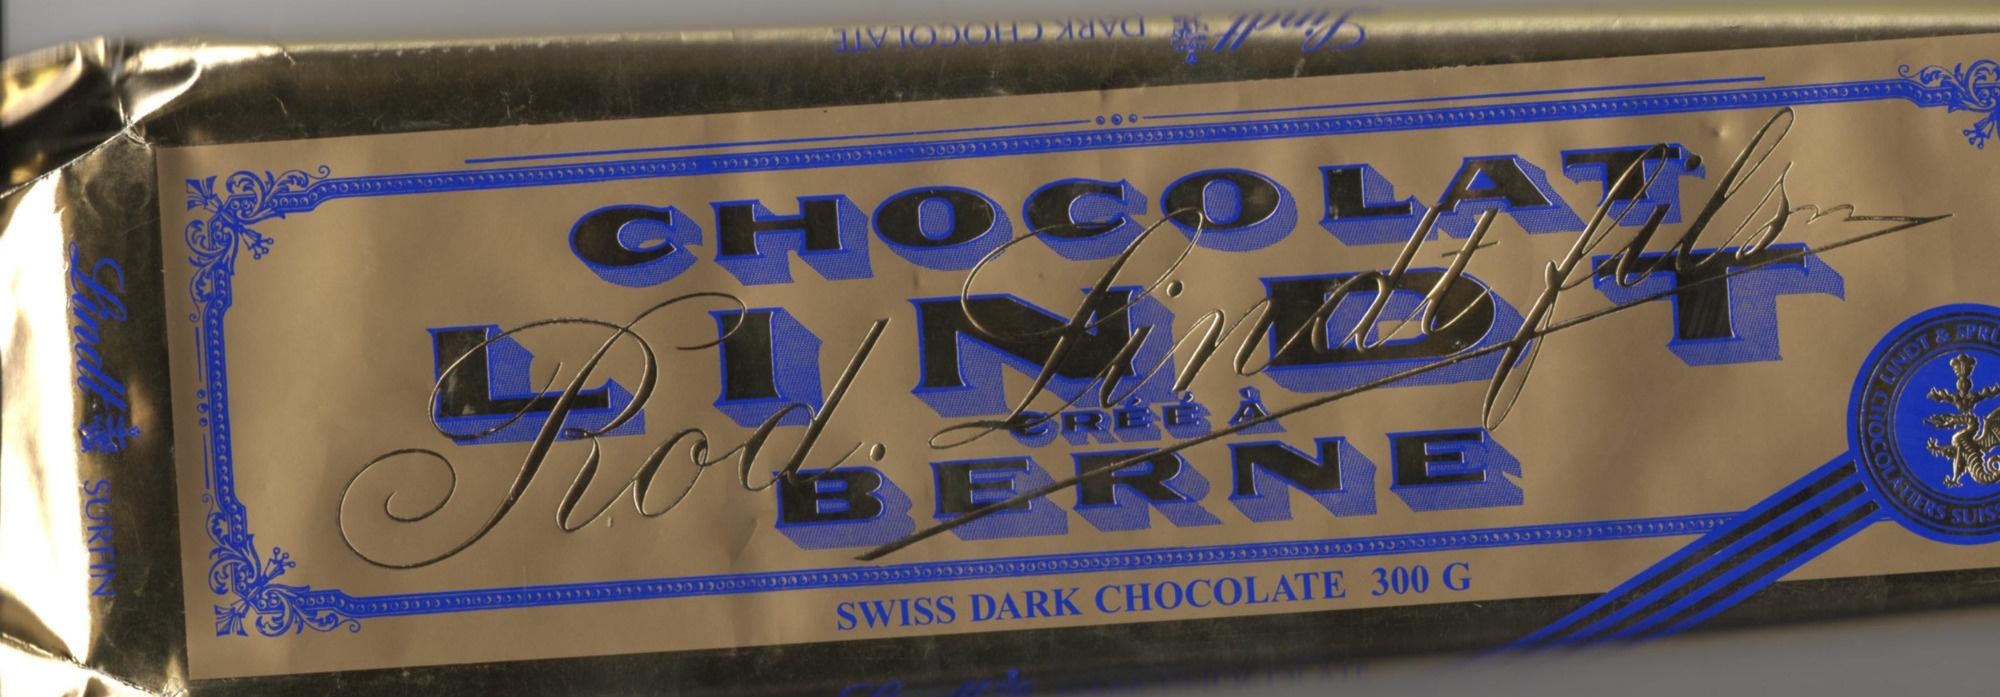 Chocolat Lindt - Product - fr